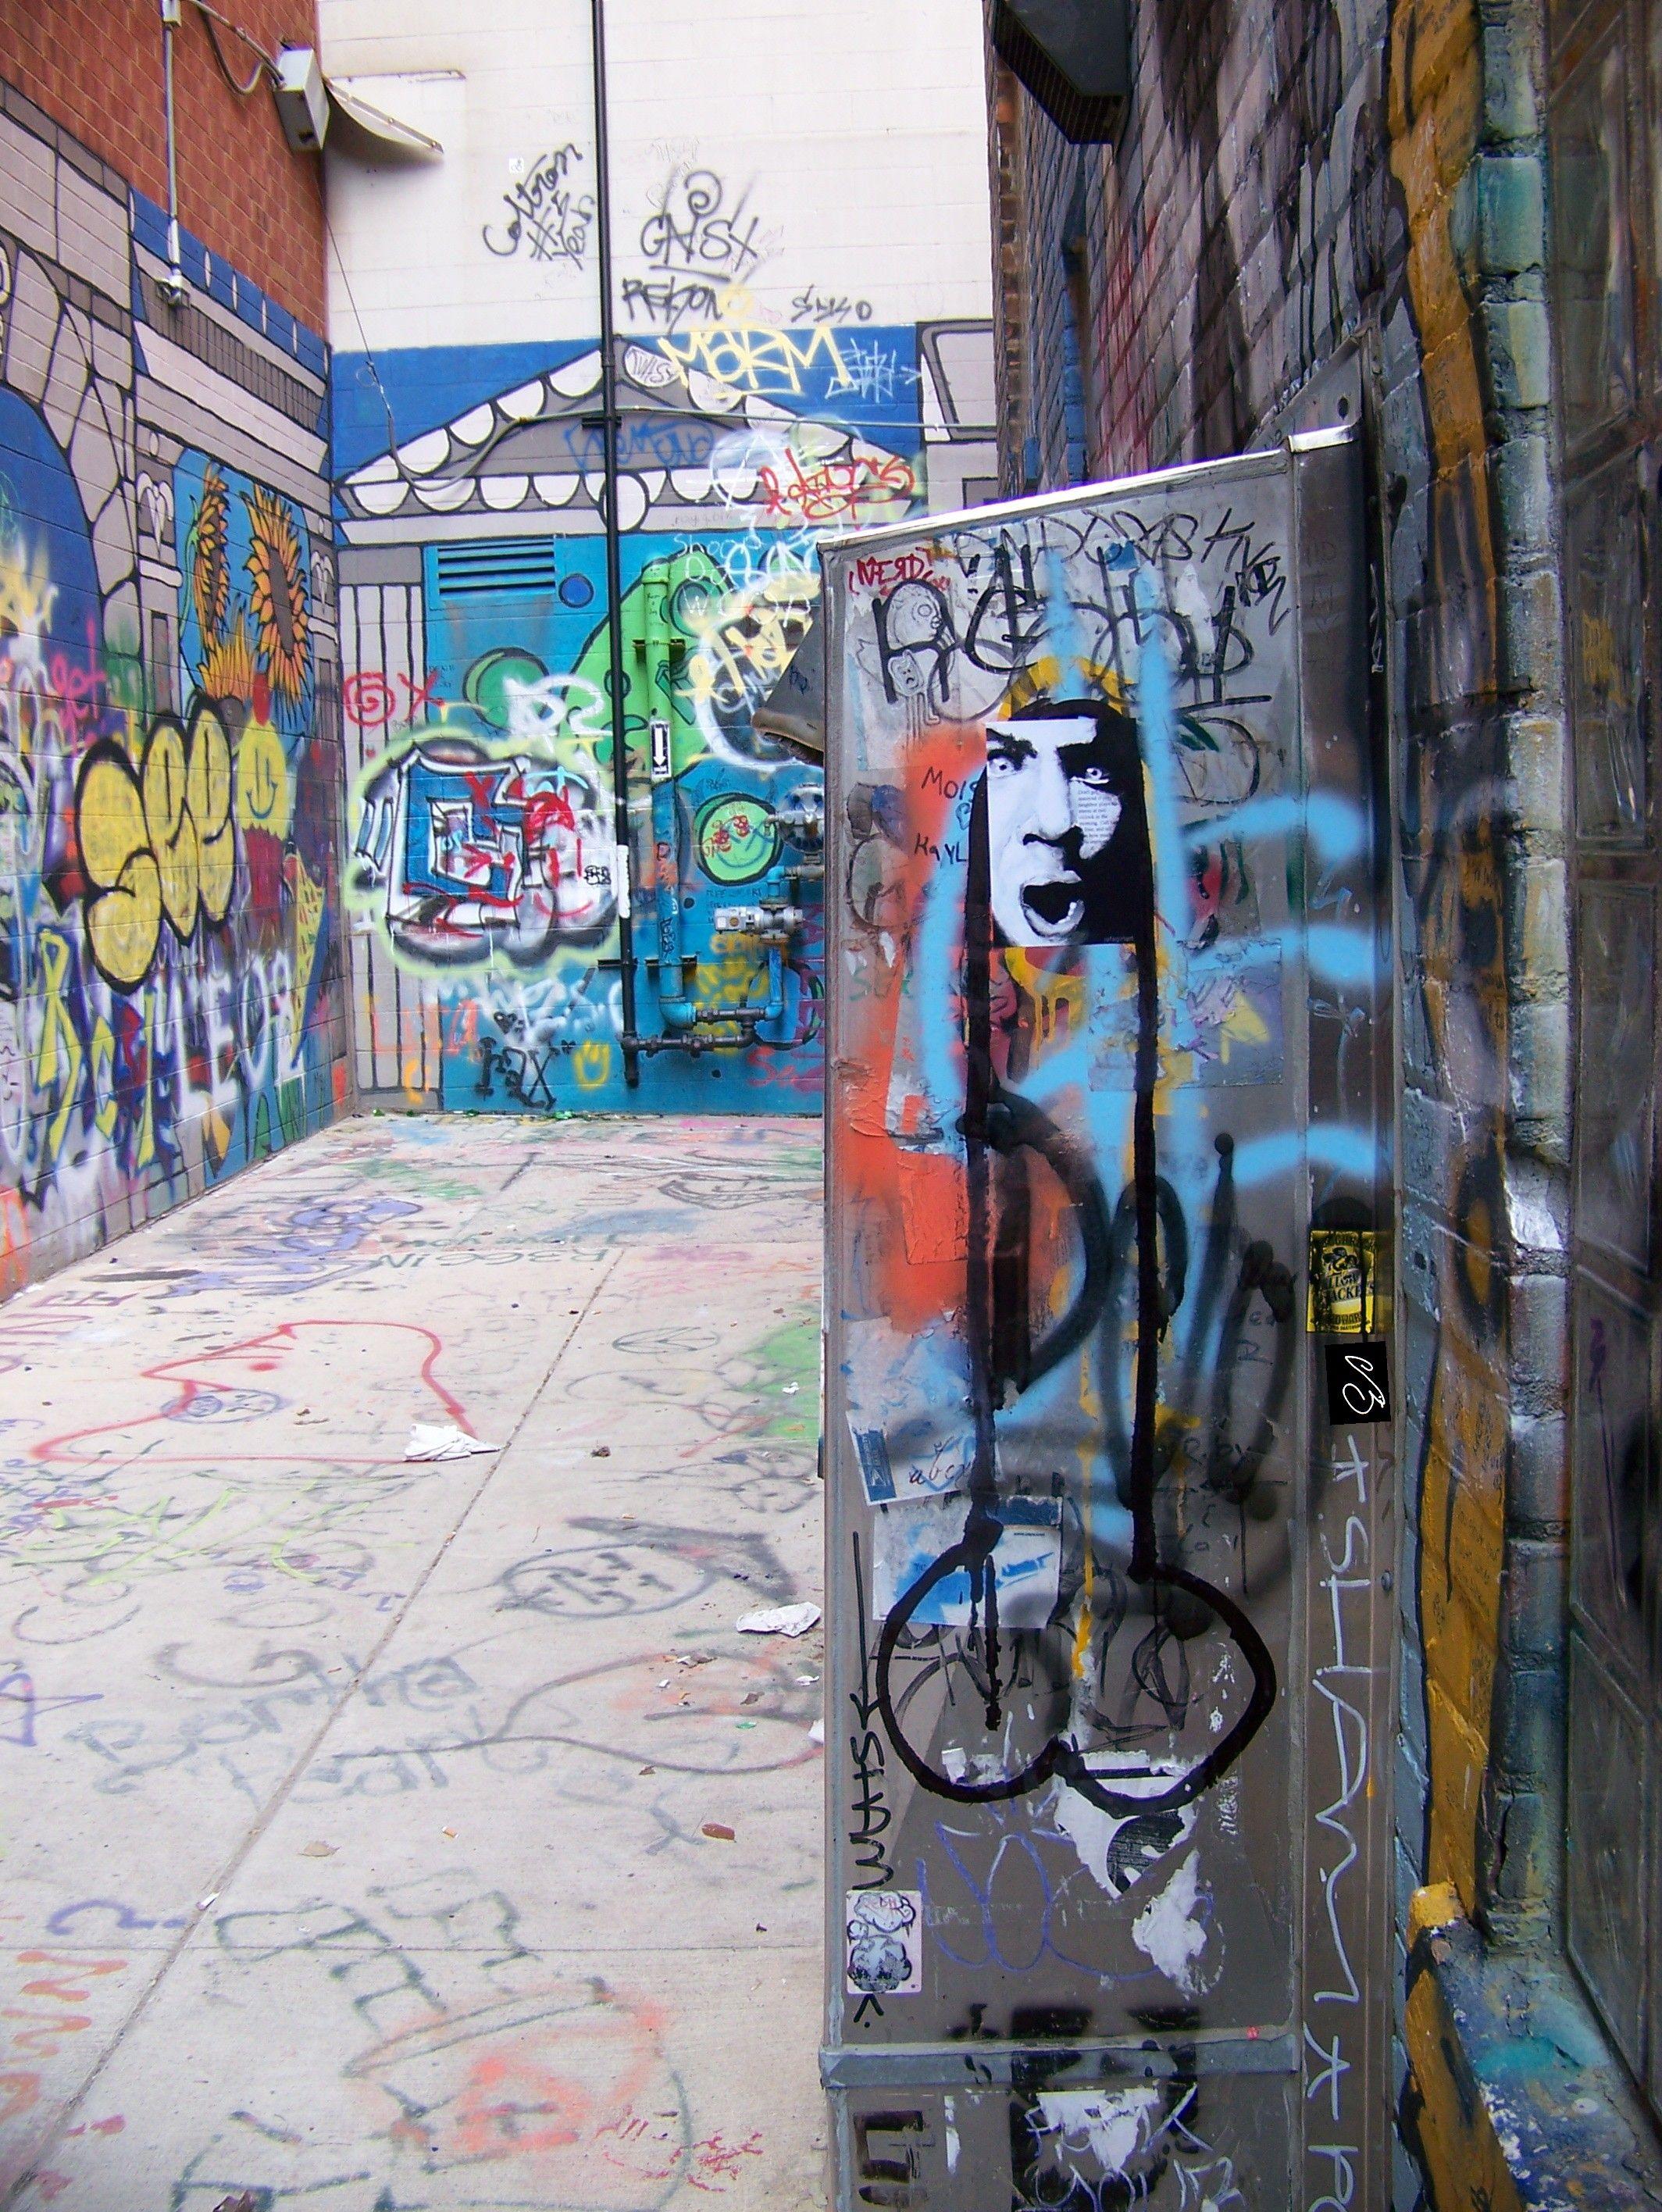 Graffiti wall ann arbor - Urbanartbomb Graffiti Bombing Graff Streetart Http Urbanartbomb Ann Arborstreet